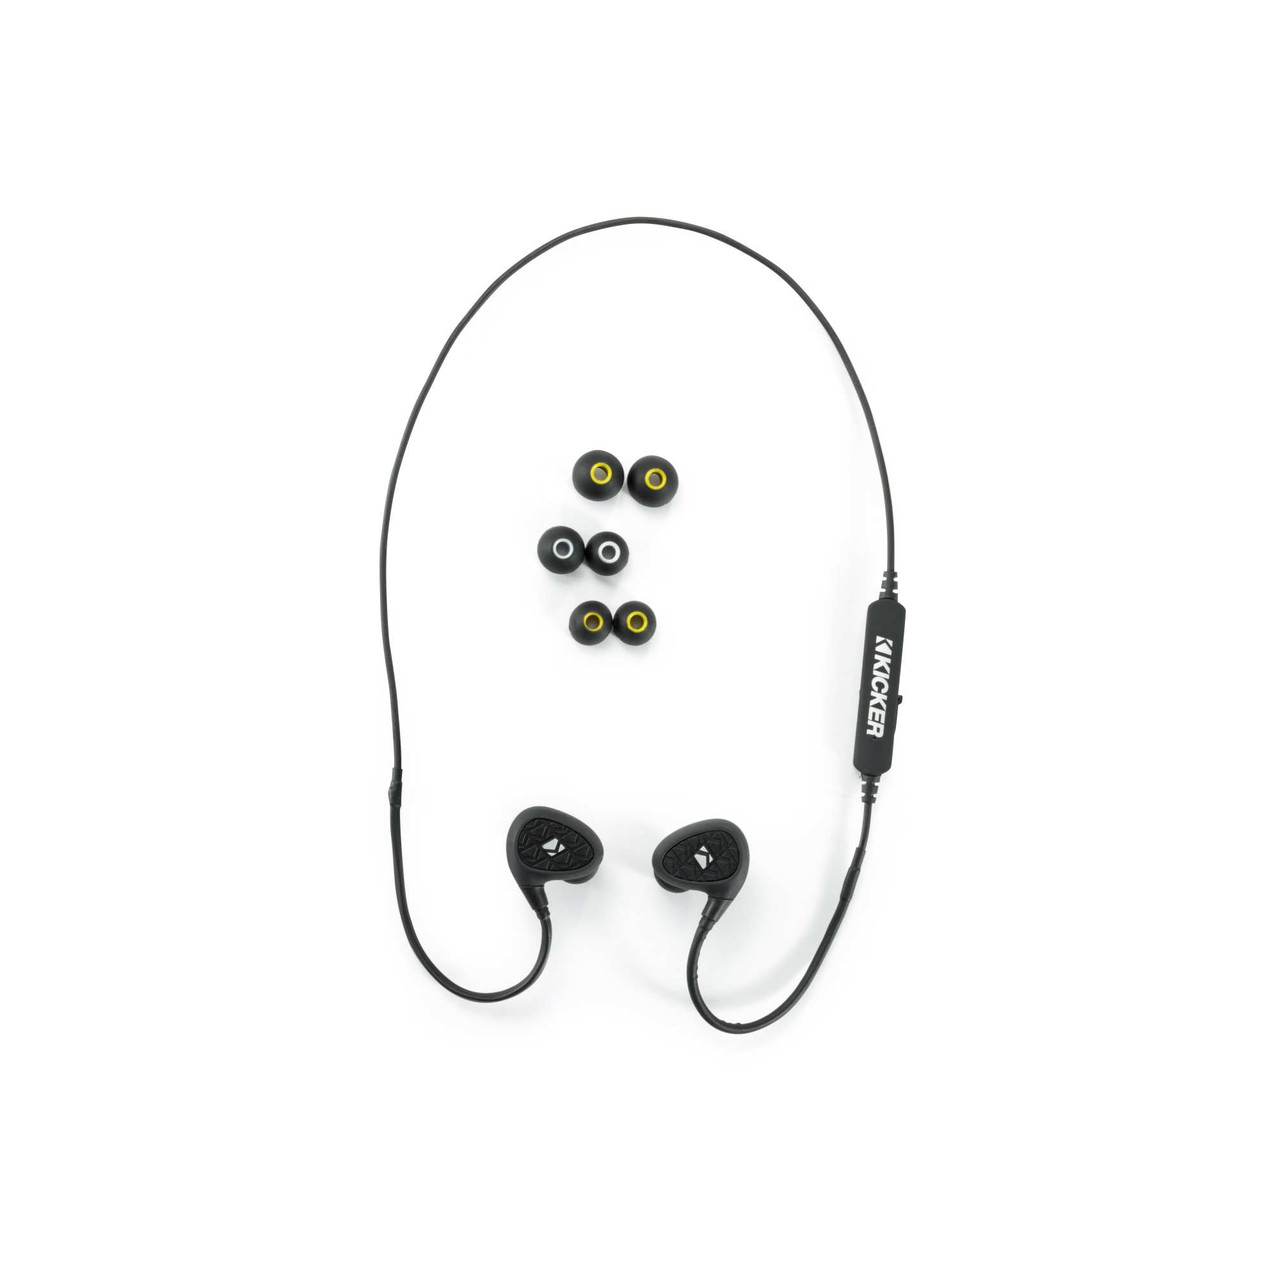 668563b13a6 ... Kicker EB400 Waterproof Bluetooth® Earbuds Earbuds - 44EB400BTB